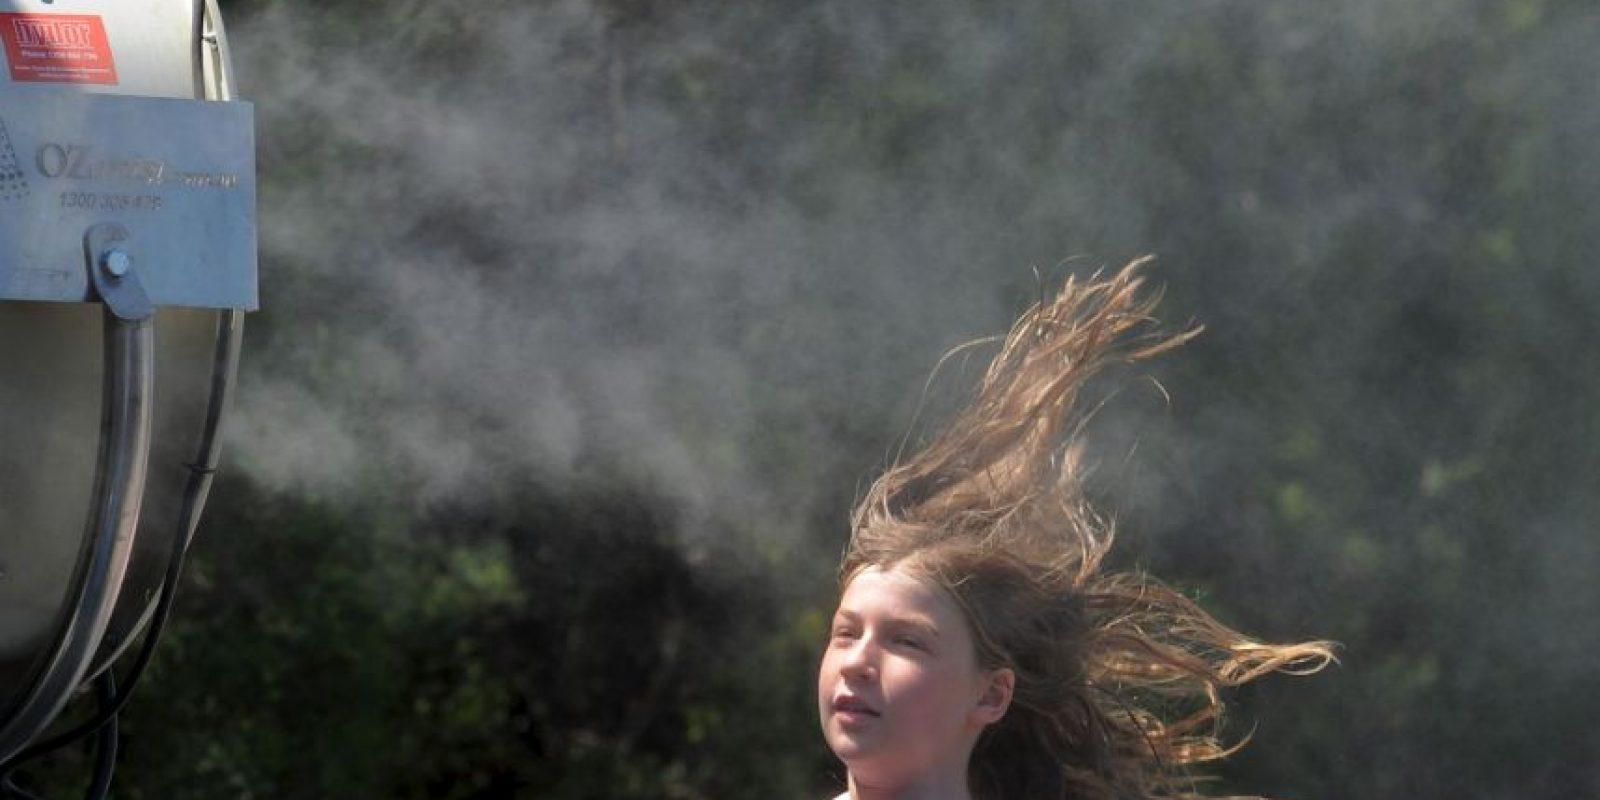 3. Agotamiento por calor Foto:Getty Images